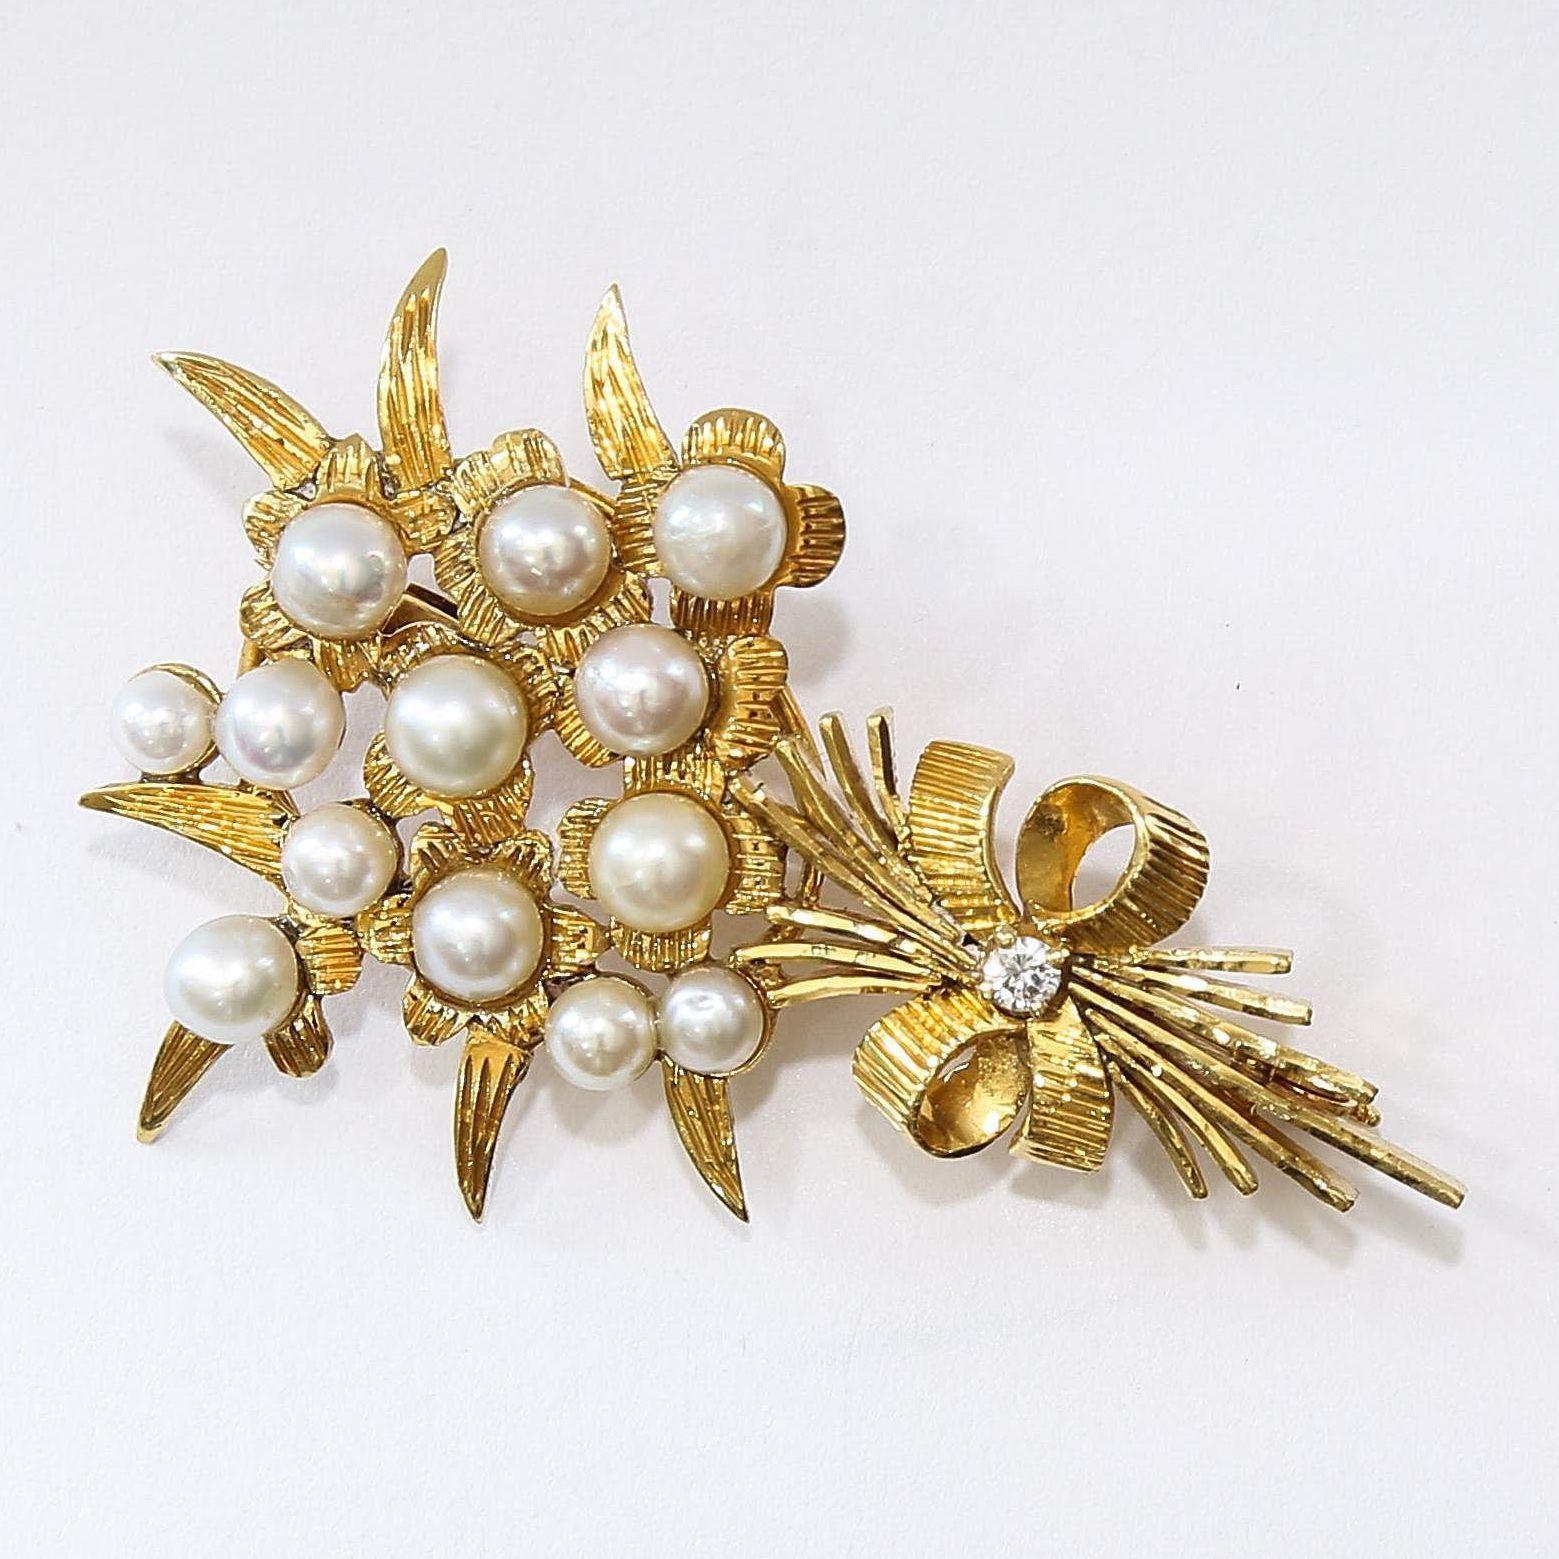 Lady's Vintage 18K Pearl & Diamond Brooch